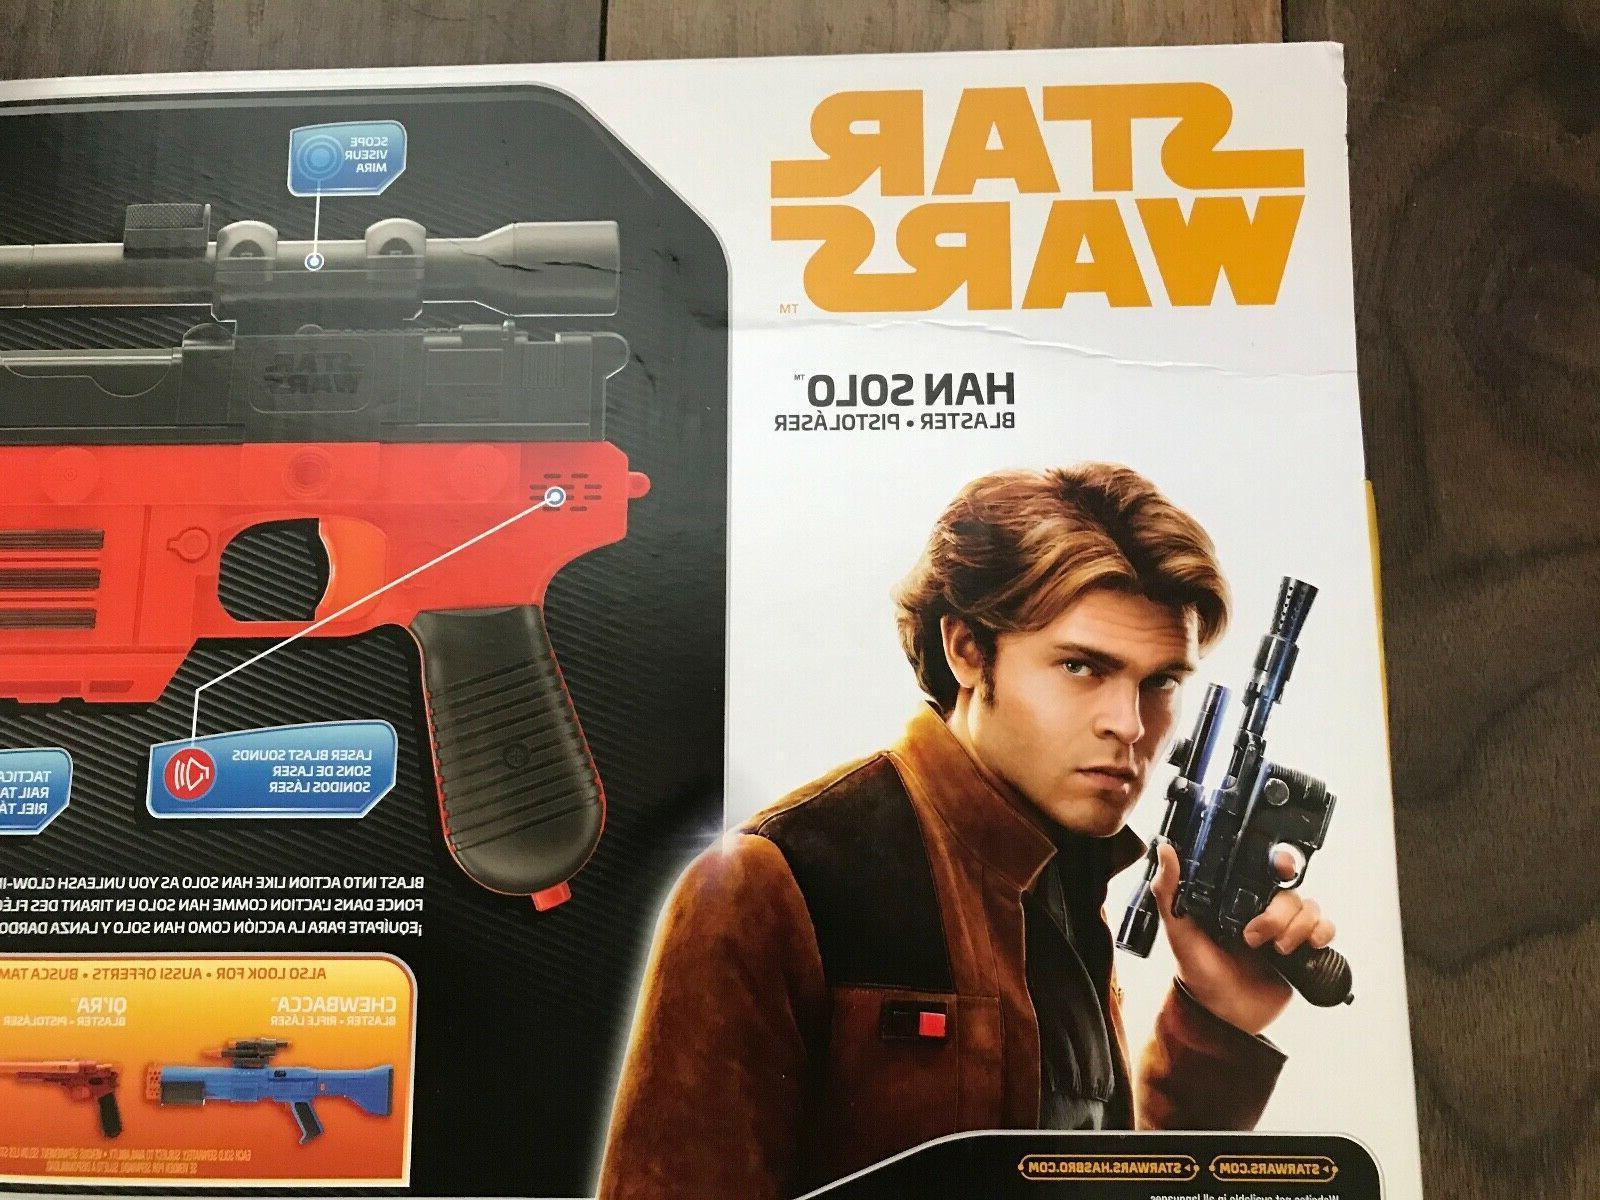 STAR NERF Lot 2 HAN Pistols NEW